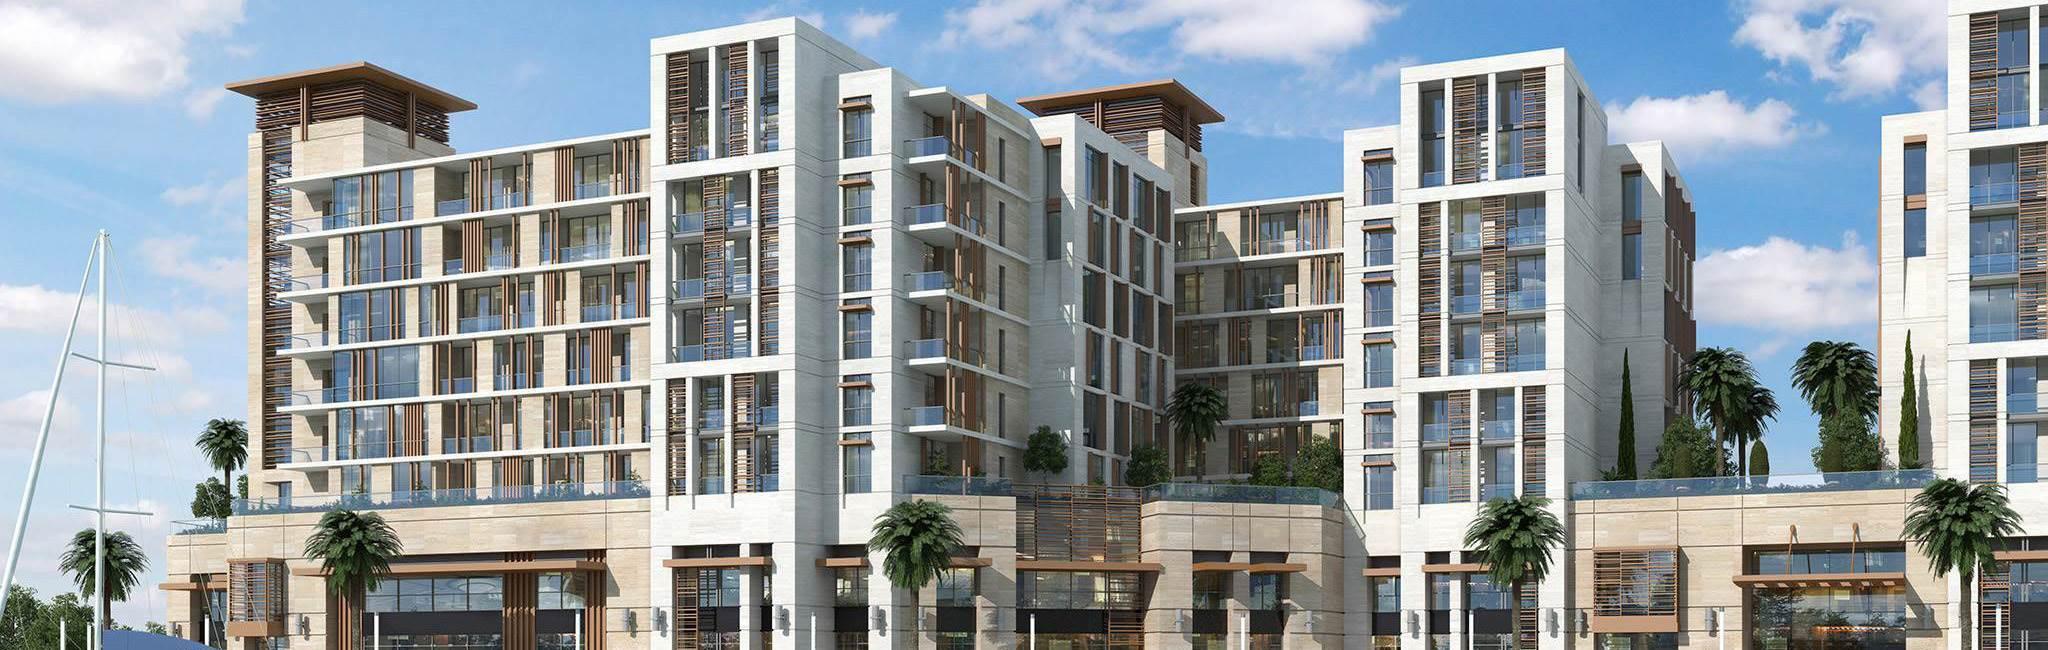 New Apartment Developments